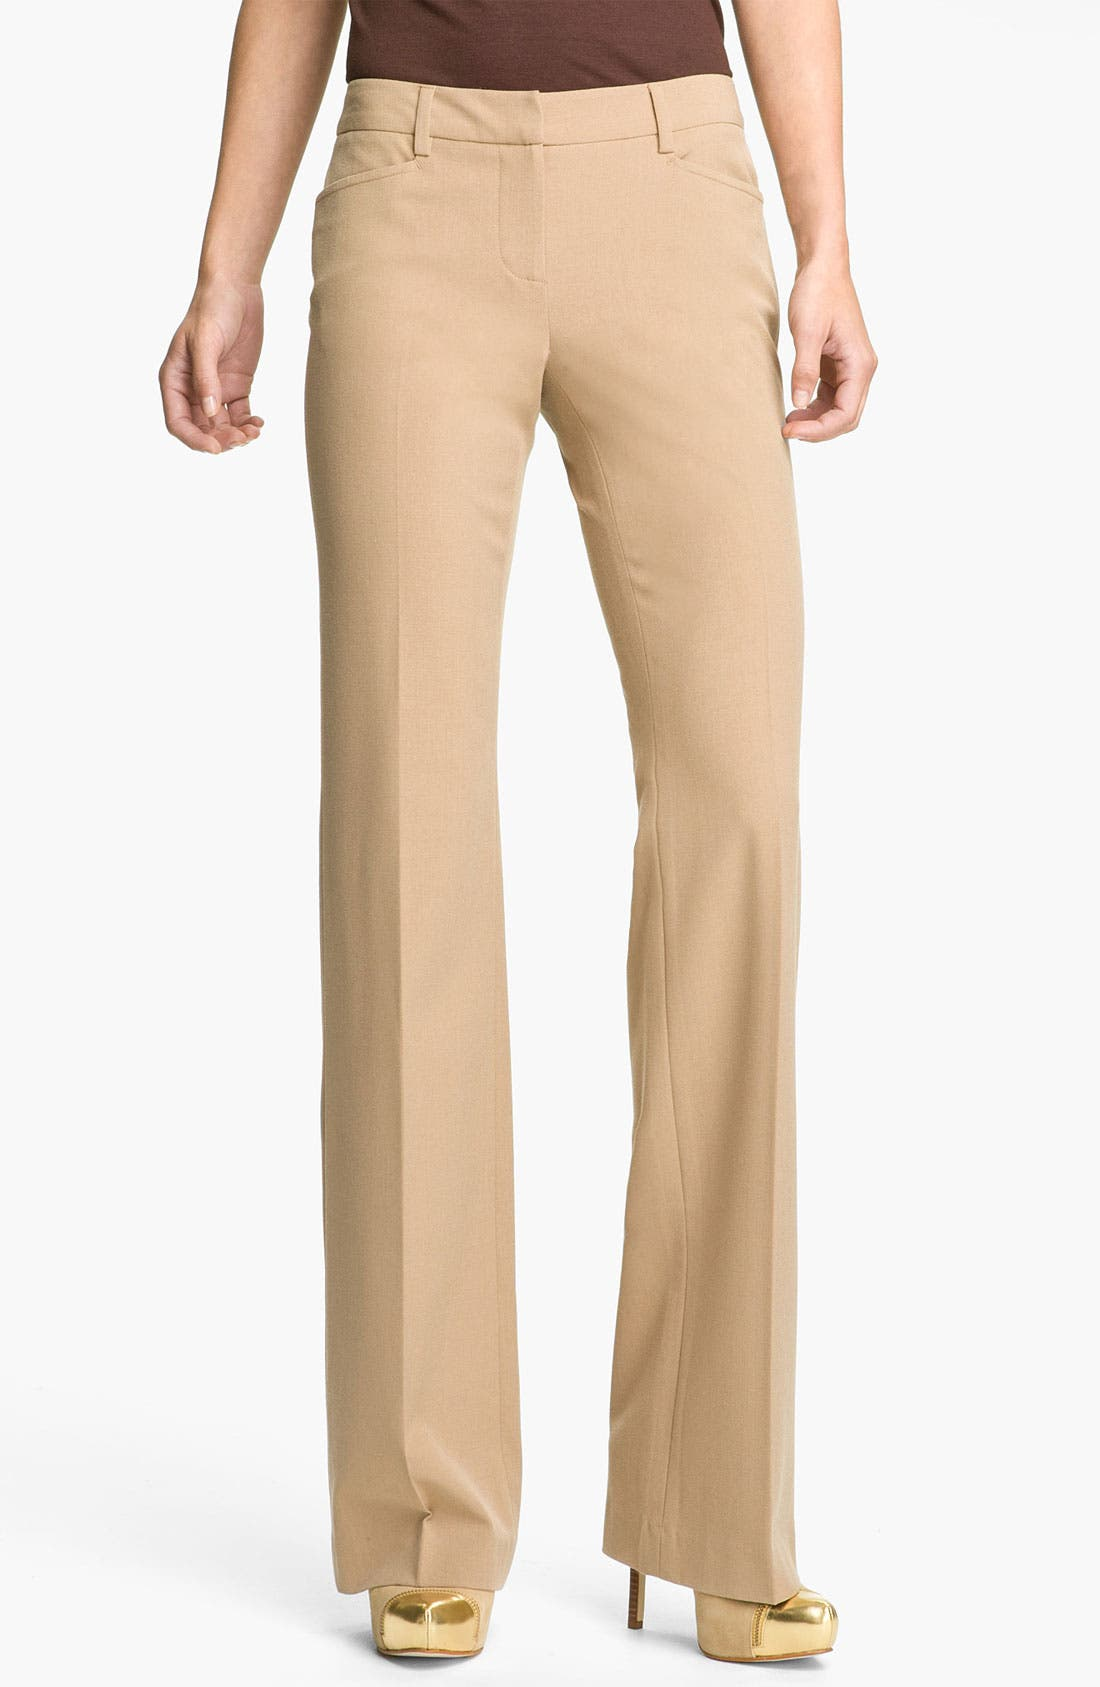 Alternate Image 1 Selected - MICHAEL Michael Kors 'Gramercy' Pants